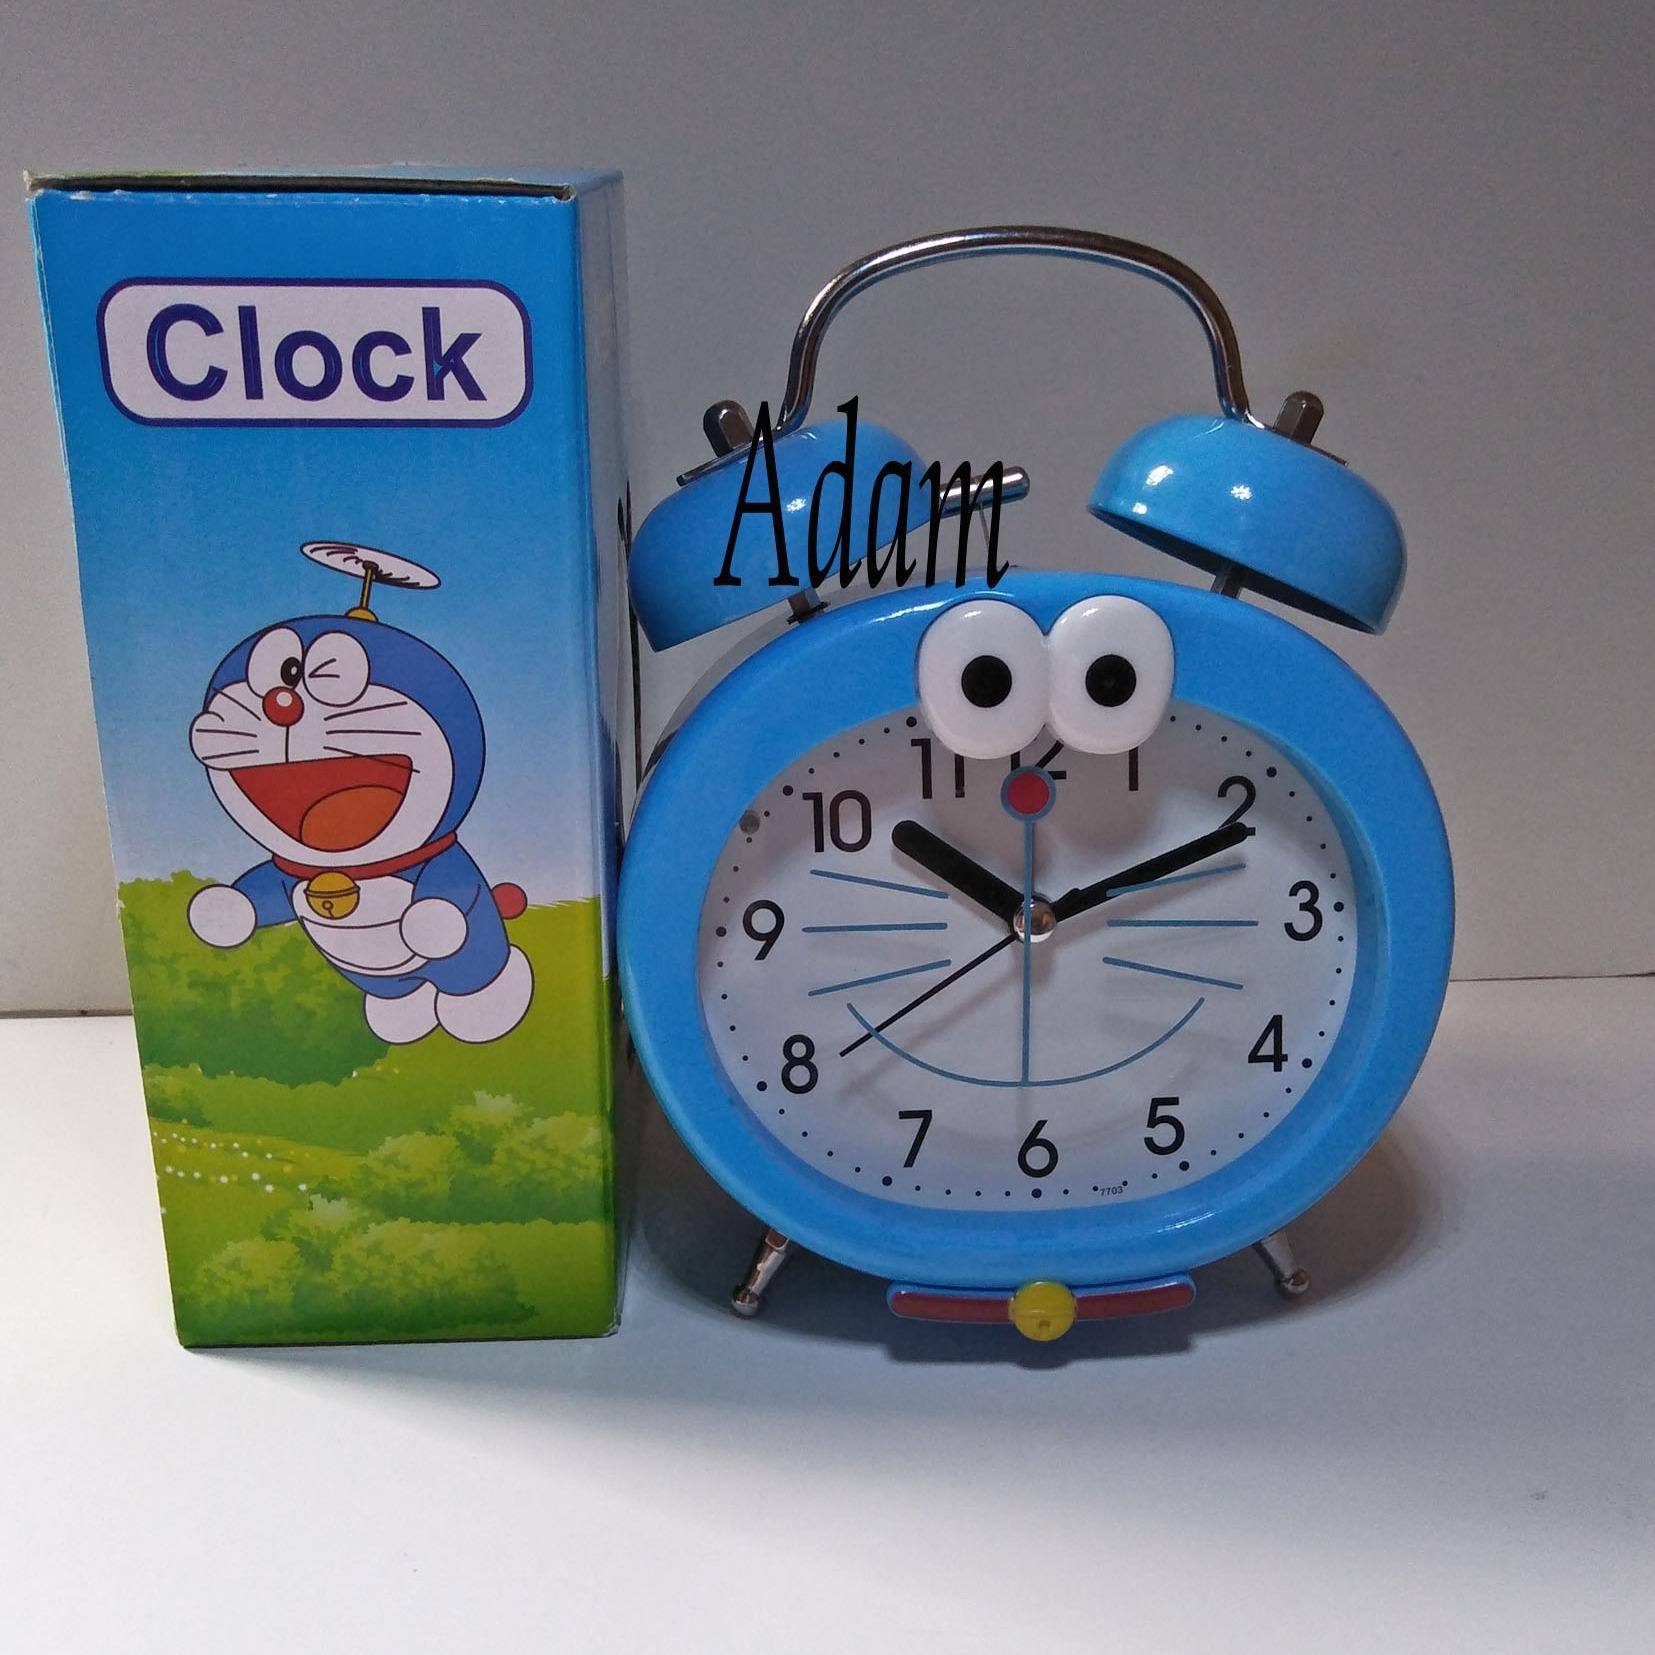 Cek Harga Baru Jam Weker Kring Kring Jam Meja Alarm Ltts8911 Terkini ... 58180af048